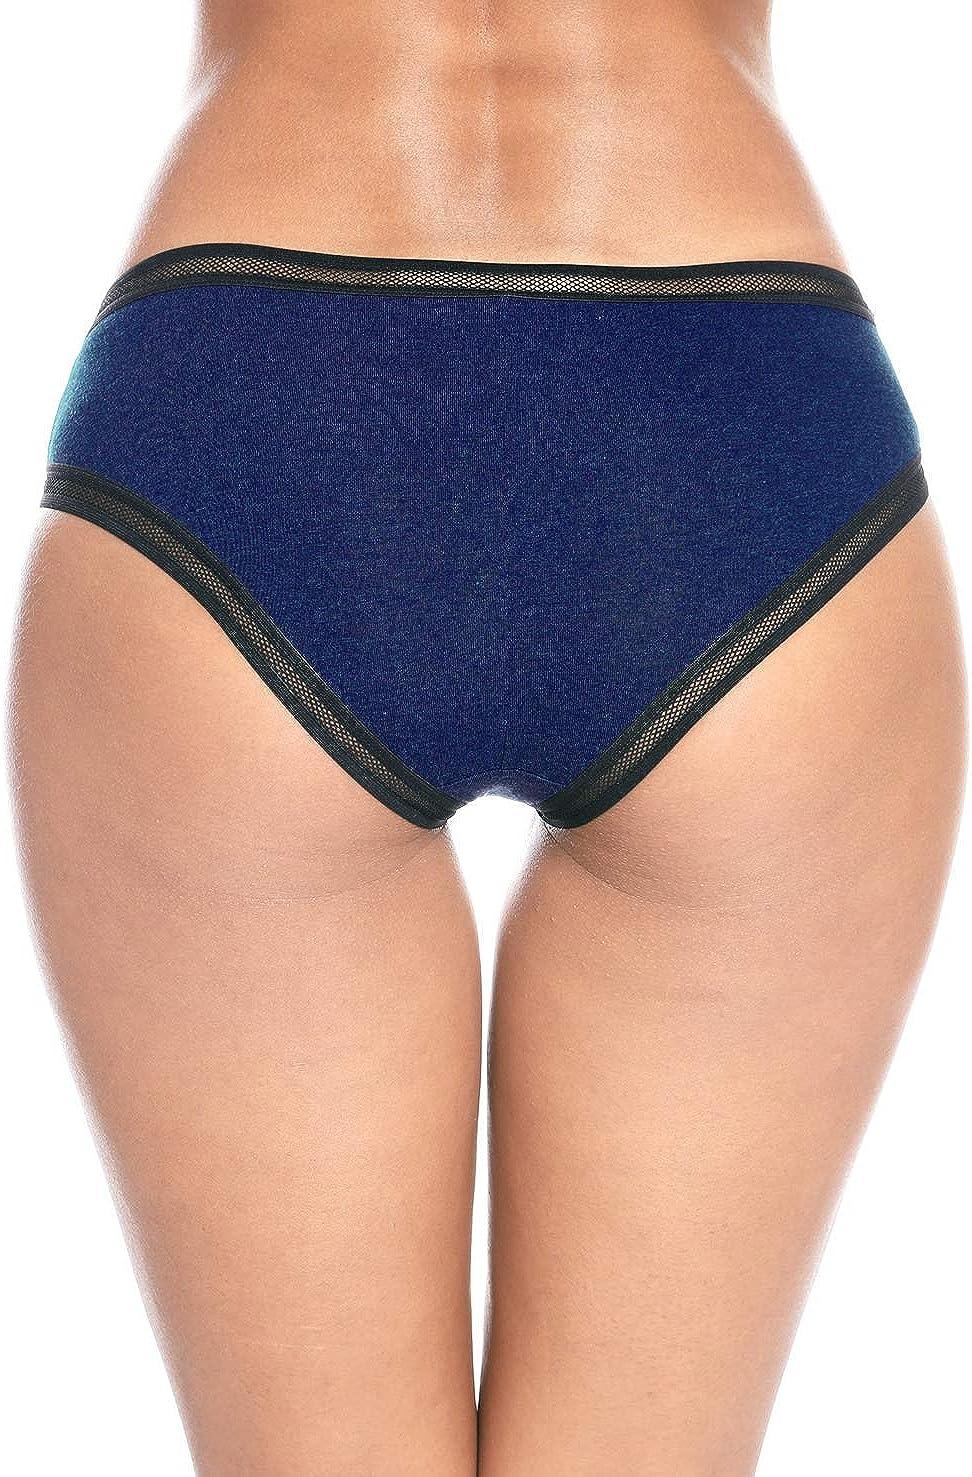 Anwell Pantys Damen Spitze Unterhosen Baumwolle Hipster Unterw/äsche Sport 4er Pack